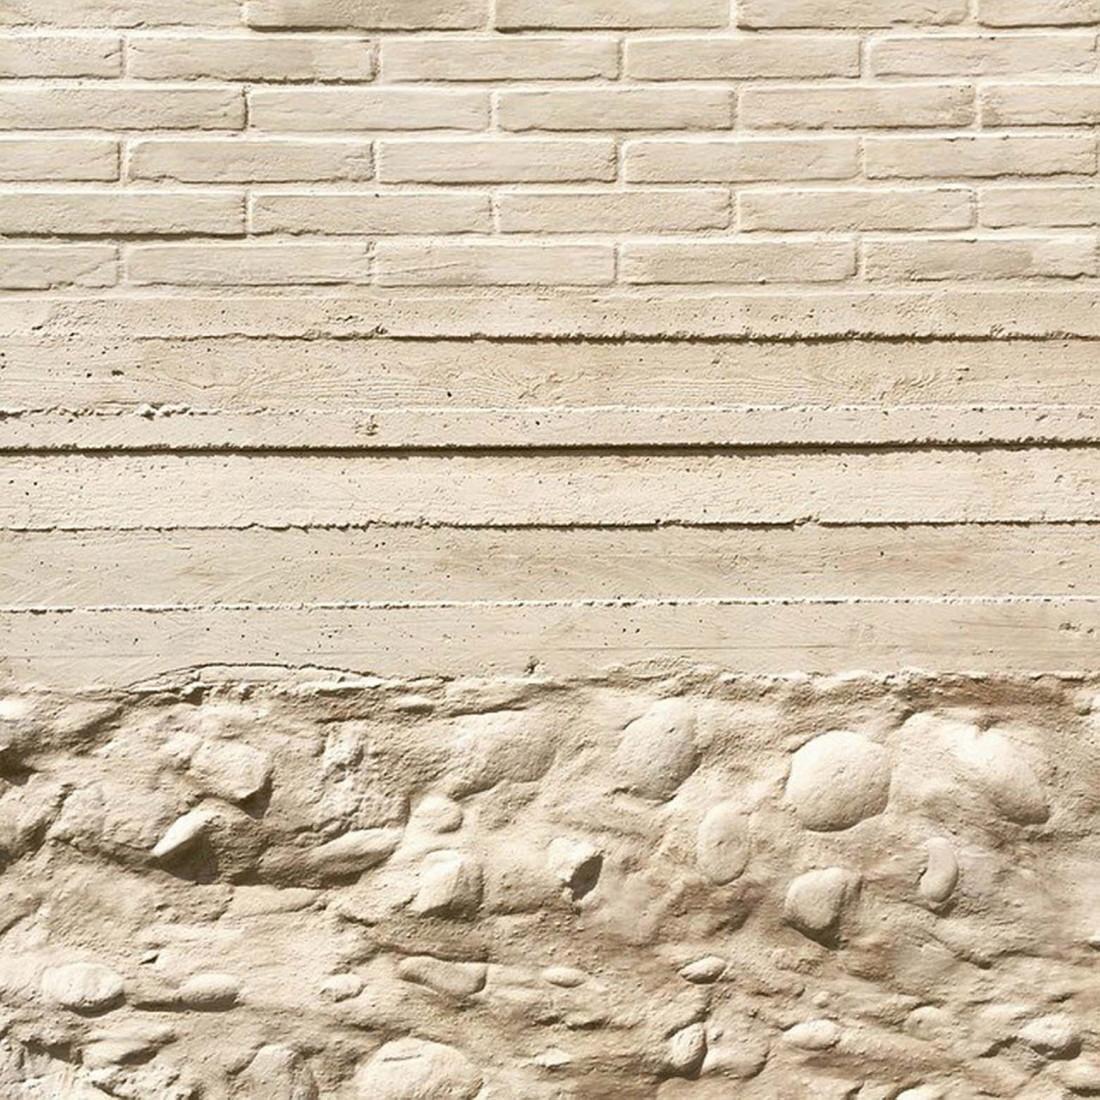 Реставрация виллы Brolo Saccomani в Италии от студии Bricolo Falsarella 3